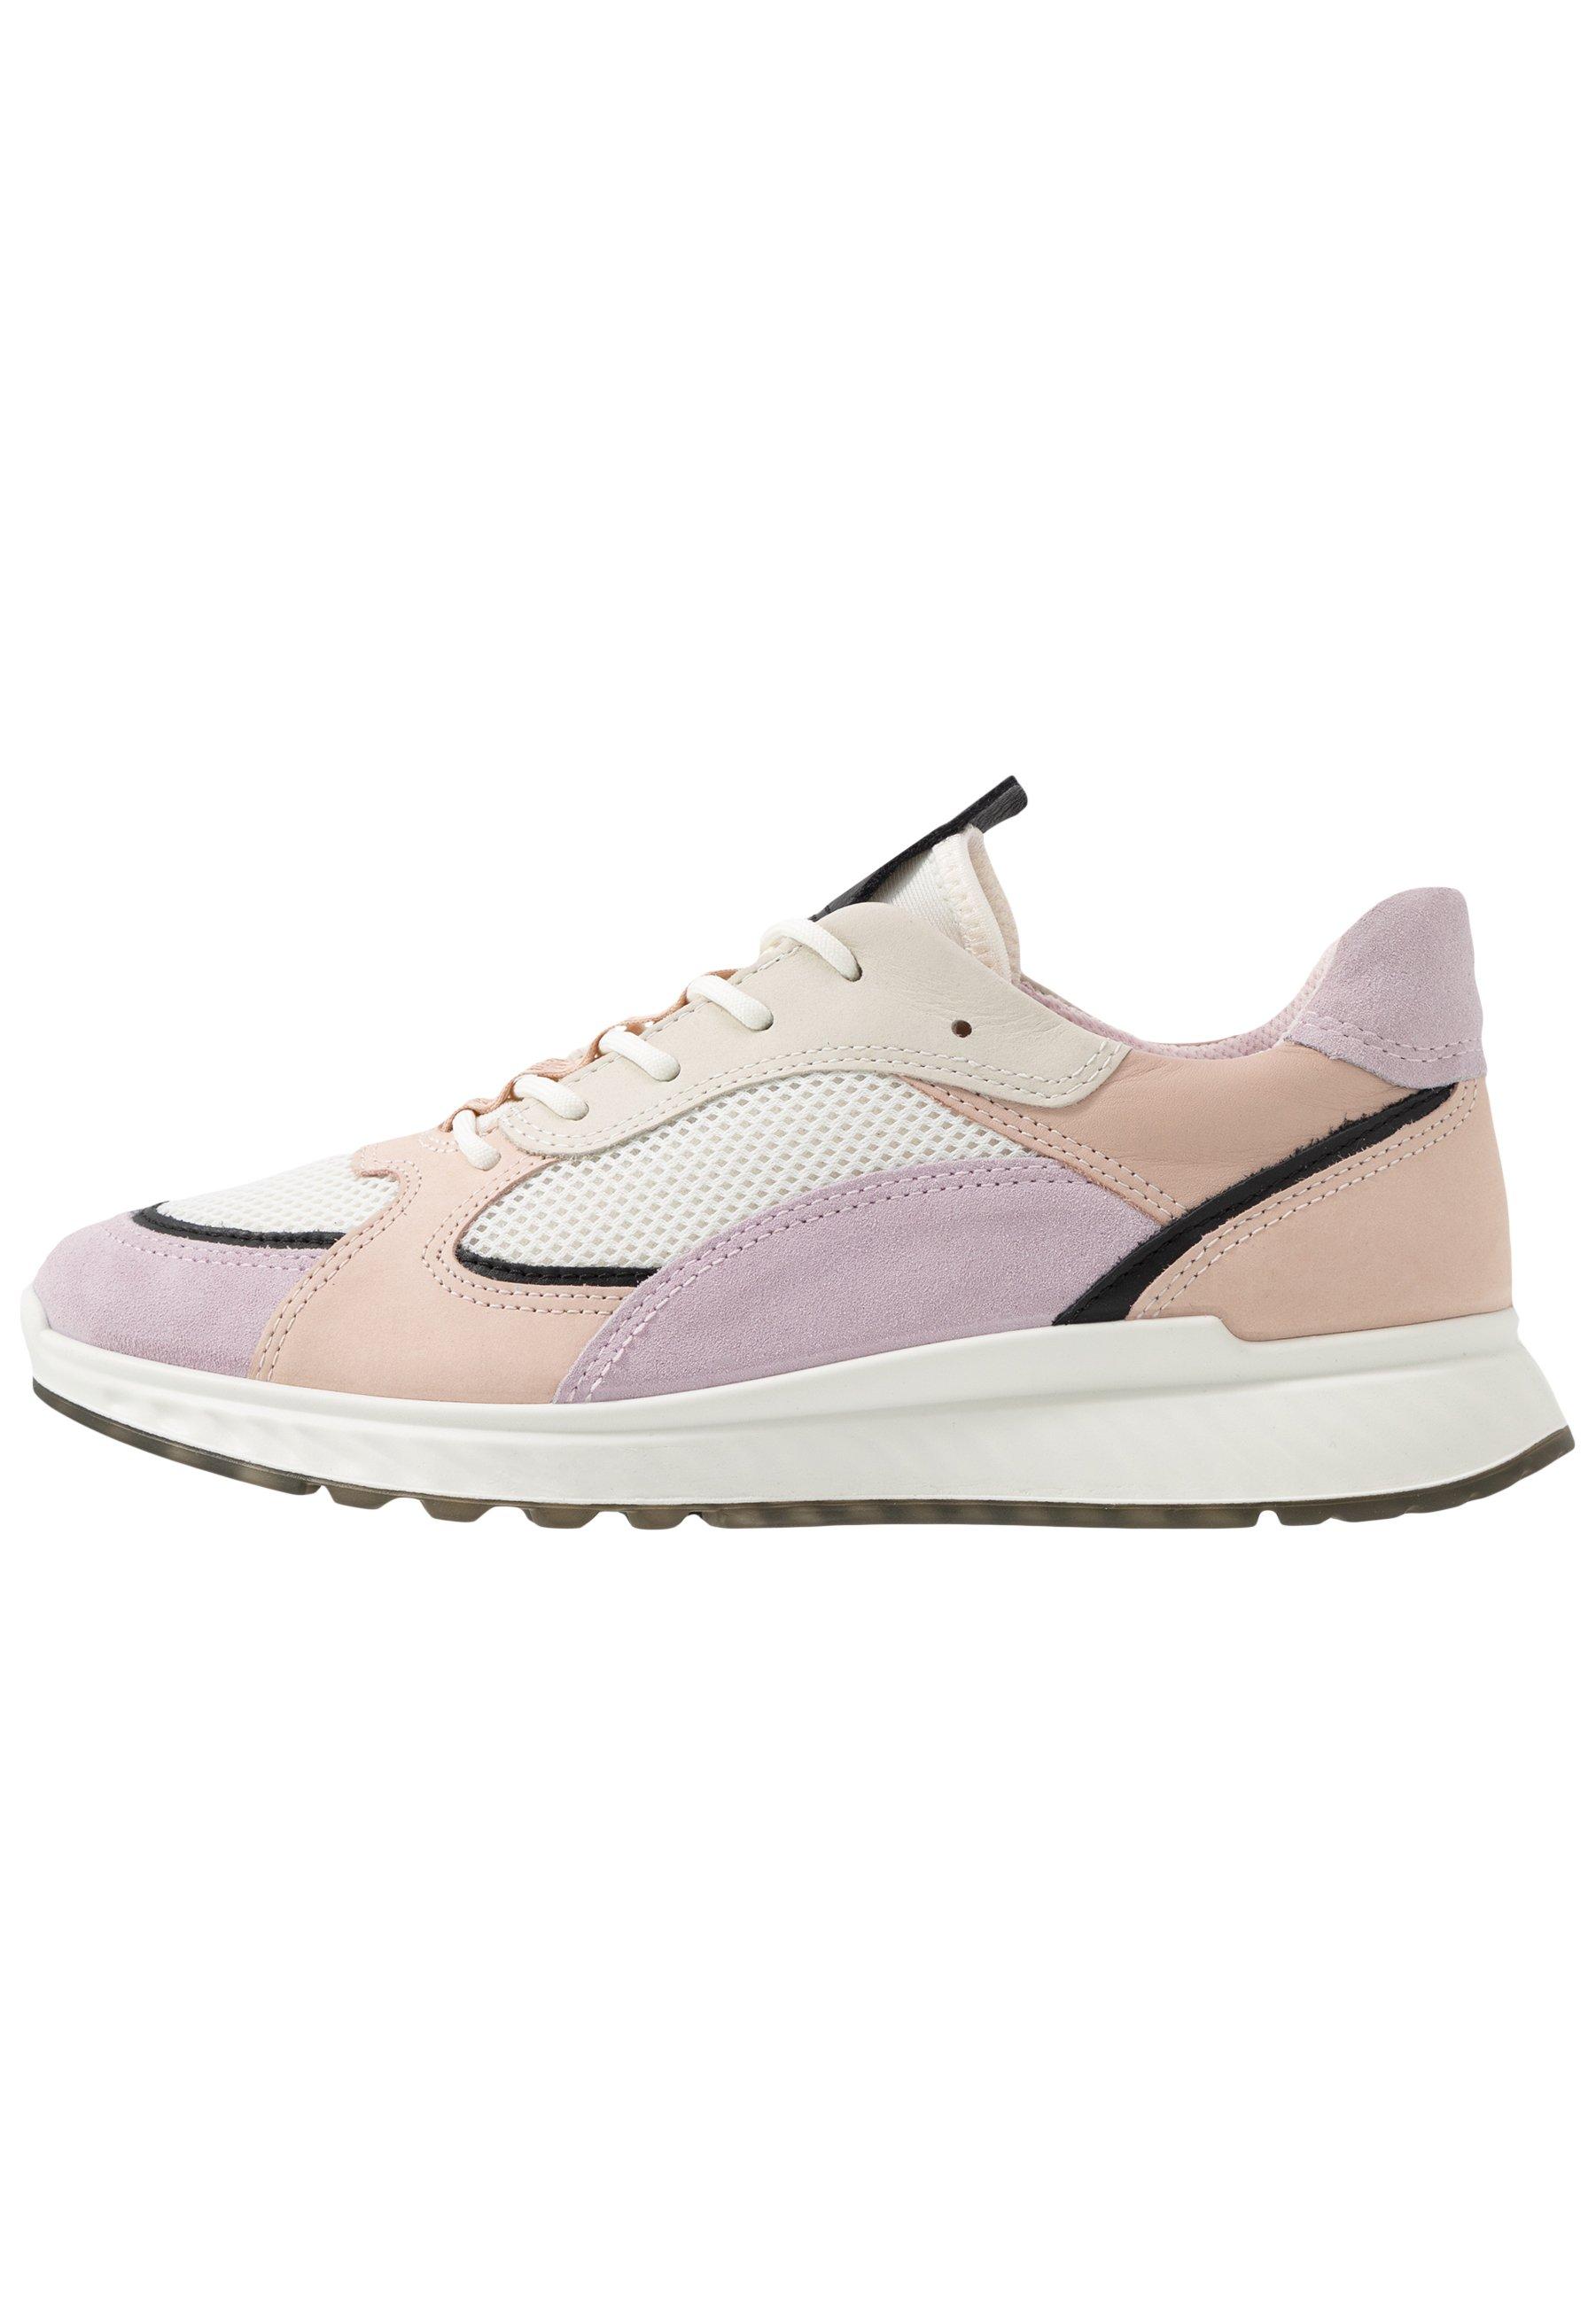 ECCO ECCO ST.1 W Sneaker low gravelwhitegrey rose